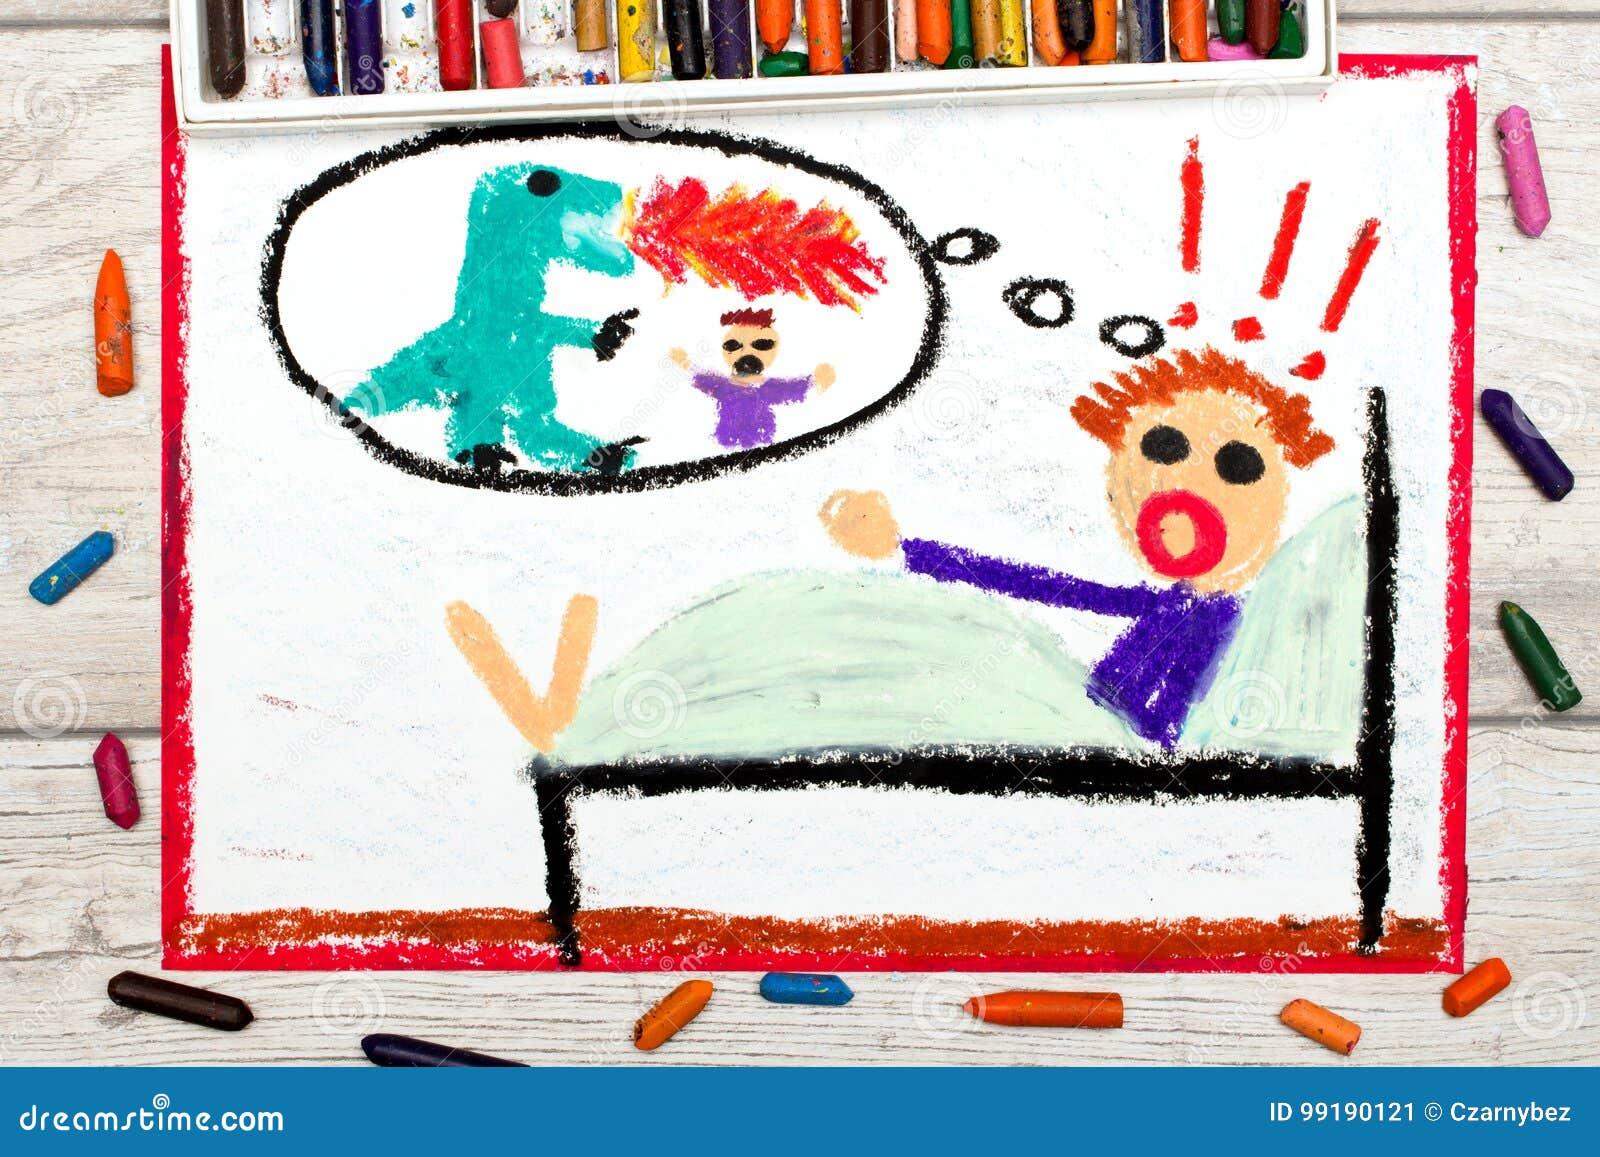 Dibujo: el niño pequeño tiene pesadillas Criatura asustadiza de la pesadilla